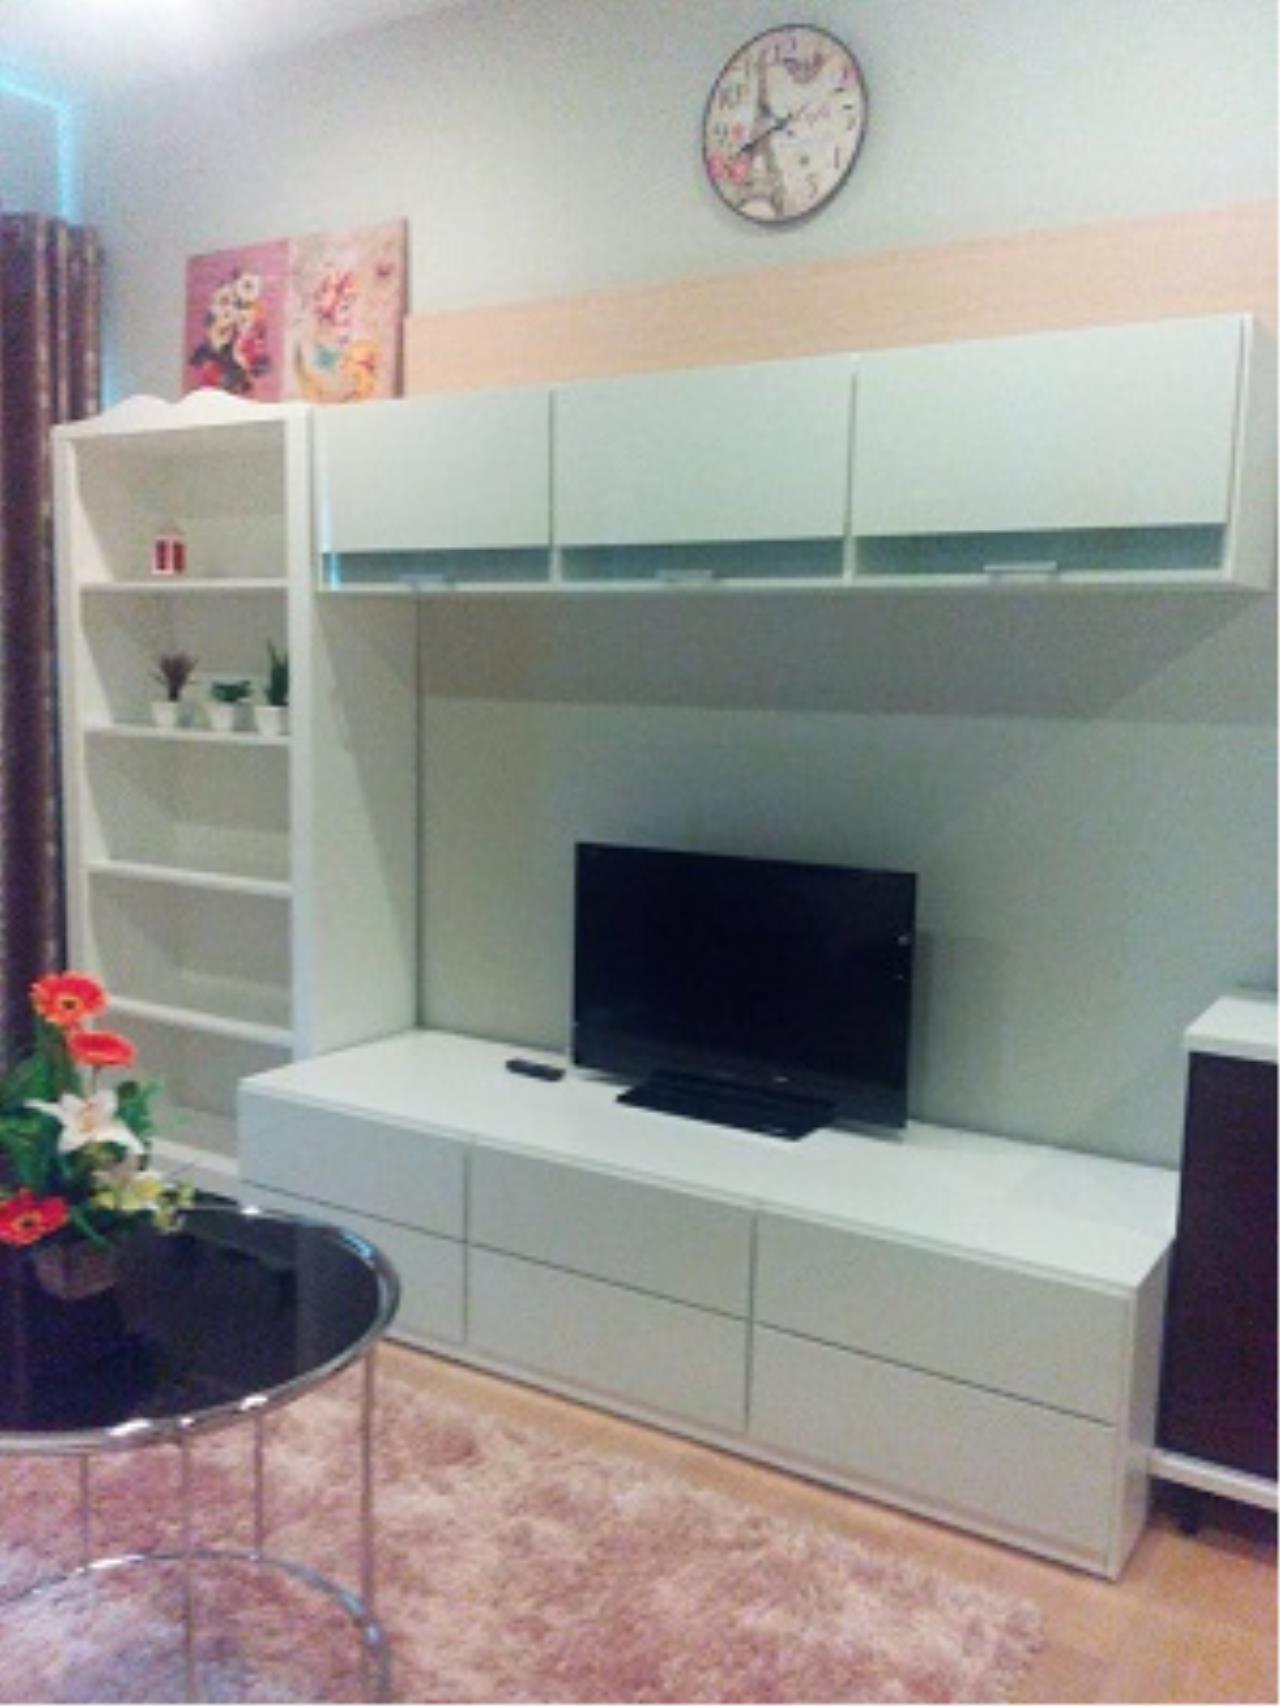 BKK Condos Agency's One bedroom condo for rent at Noble Refine  7